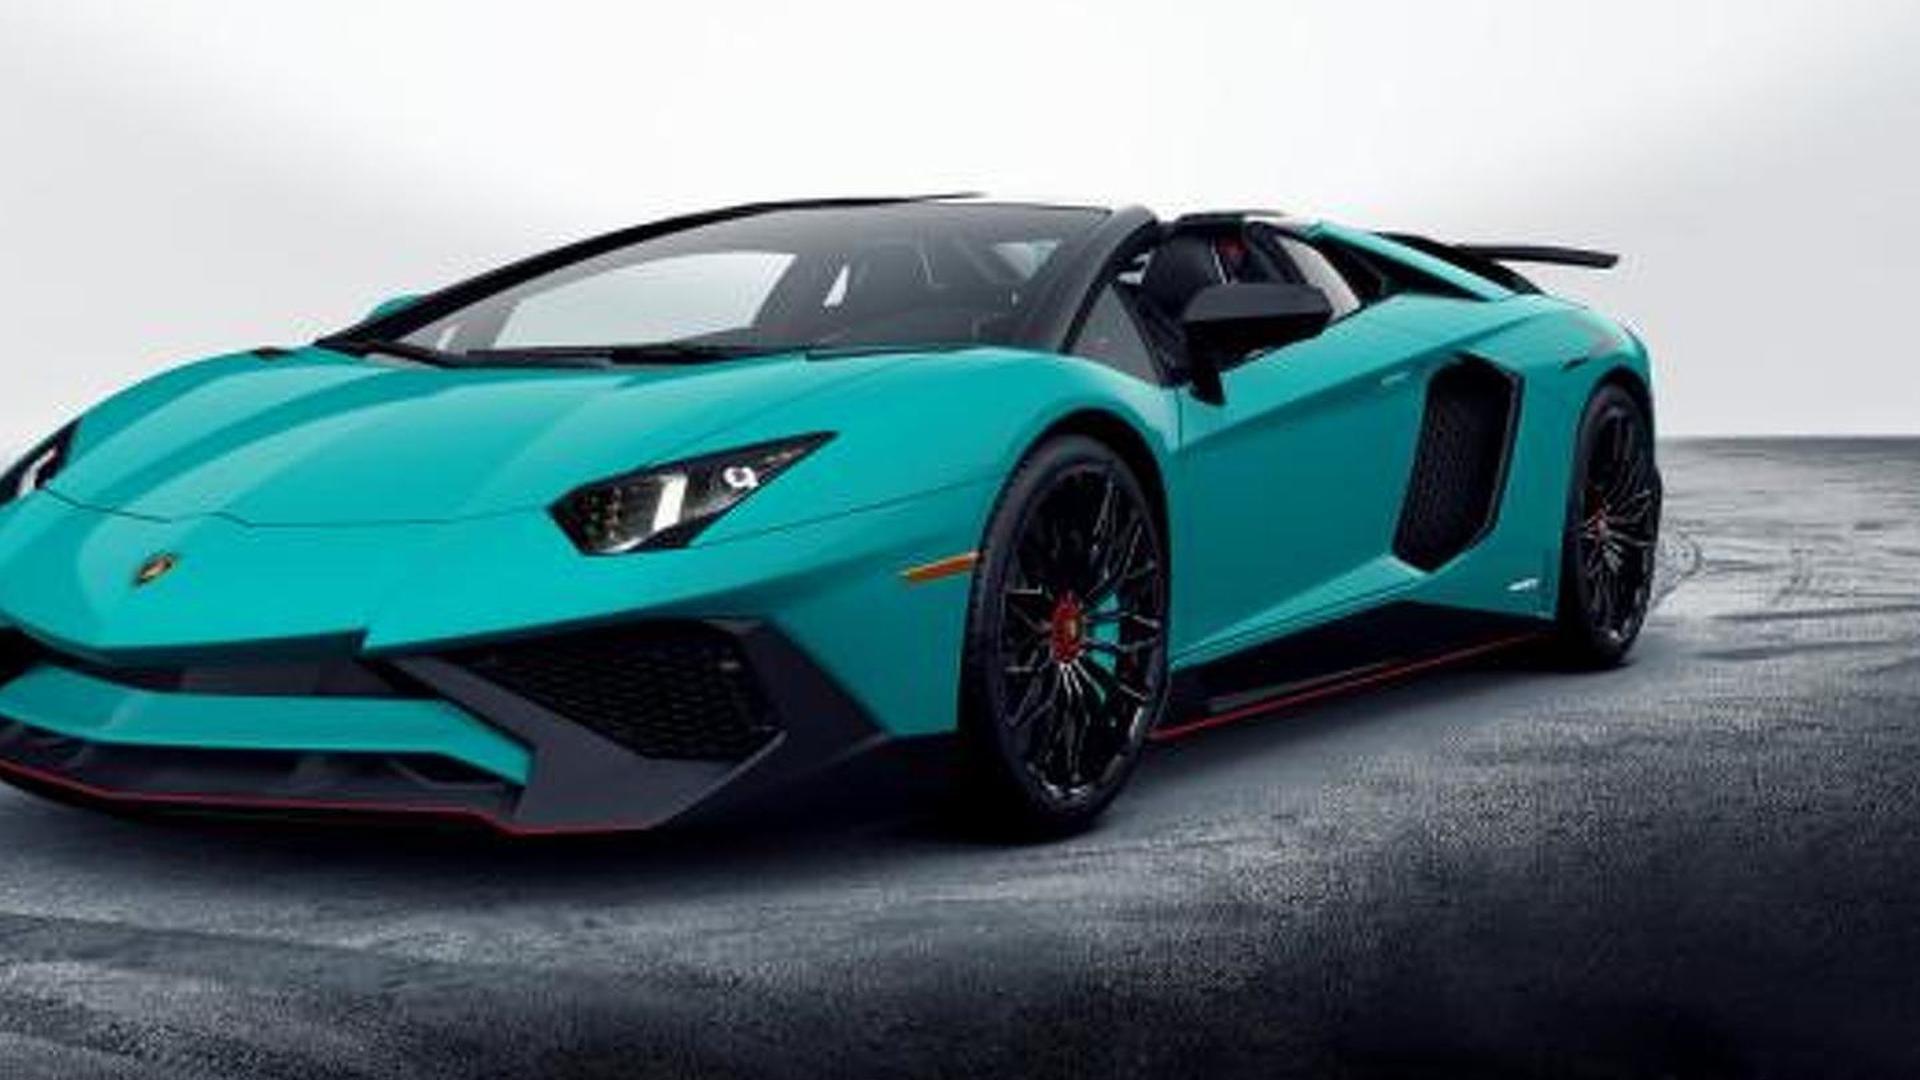 4e7a7685bb86 2017 Lamborghini Aventador LP 750-4 SuperVeloce Roadster revealed